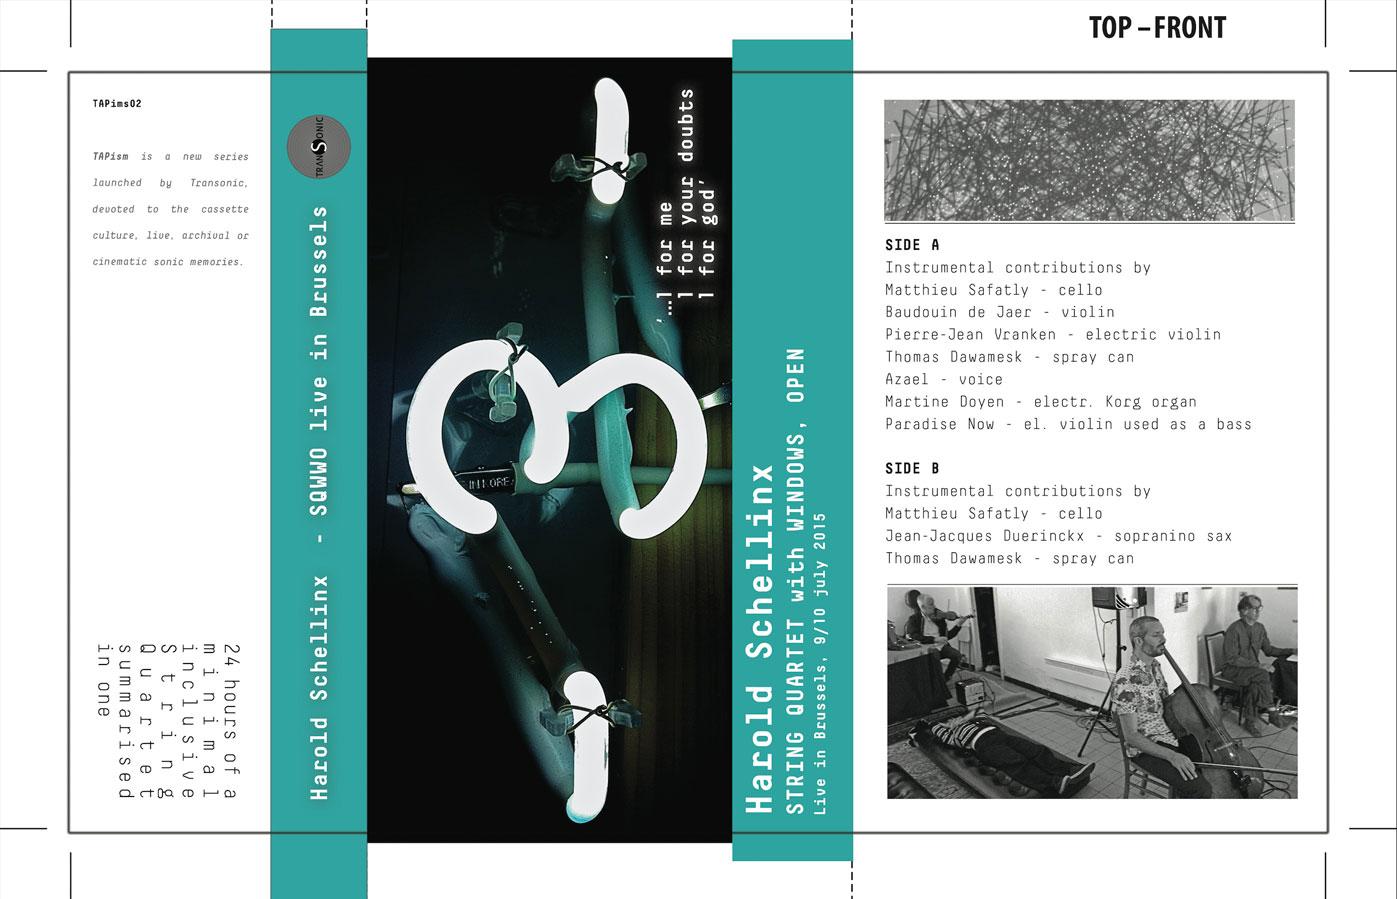 Harold-Schellinx_K7_Tape-Cover_front-full_City-Sonic_Mons2015_Transcultures